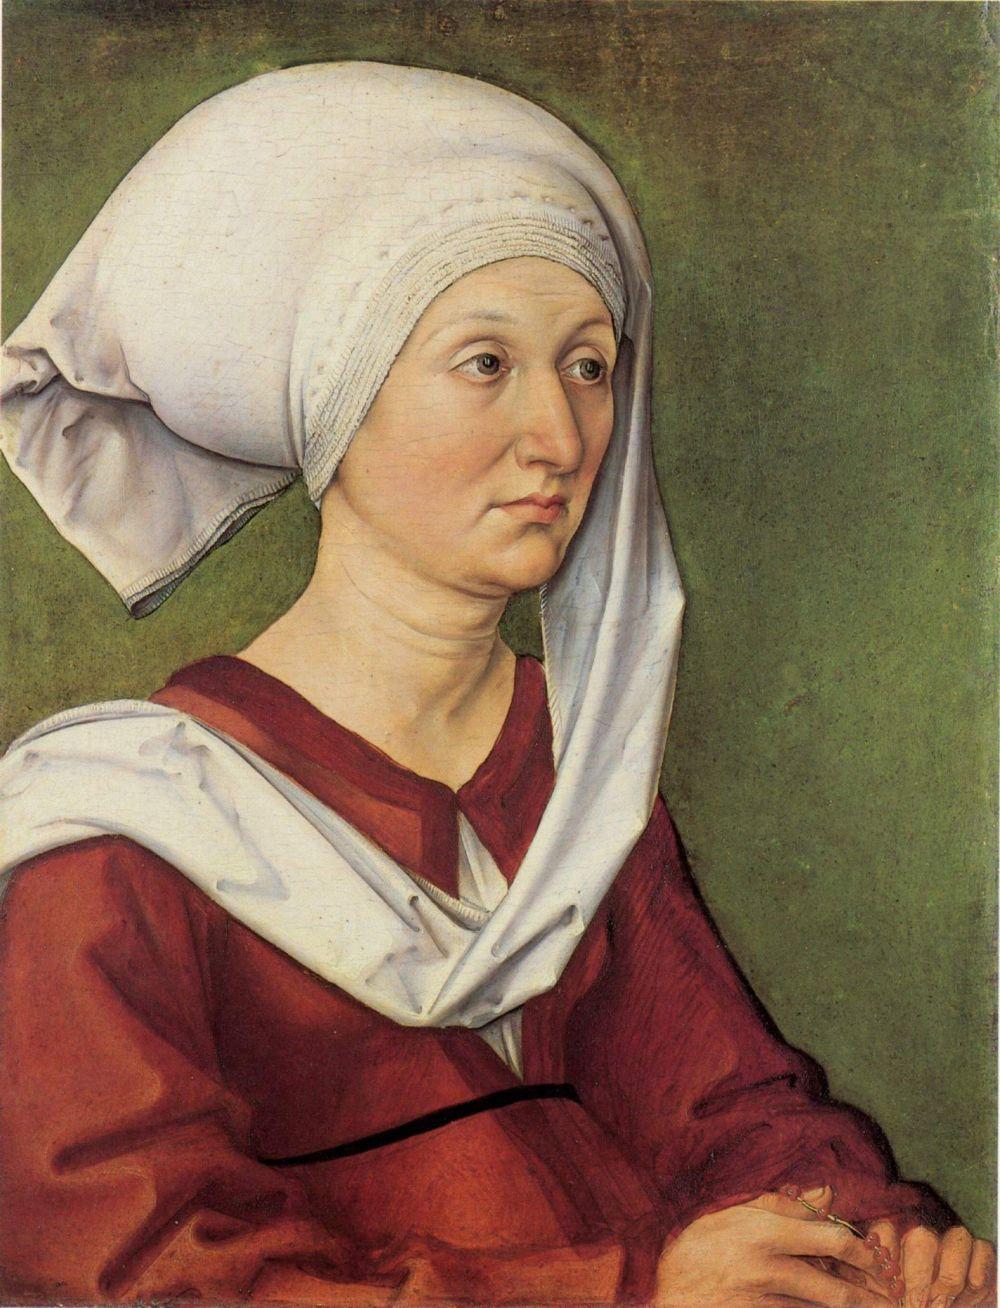 Albrecht Dürer. Portrait of Barbara dürer, née Holper